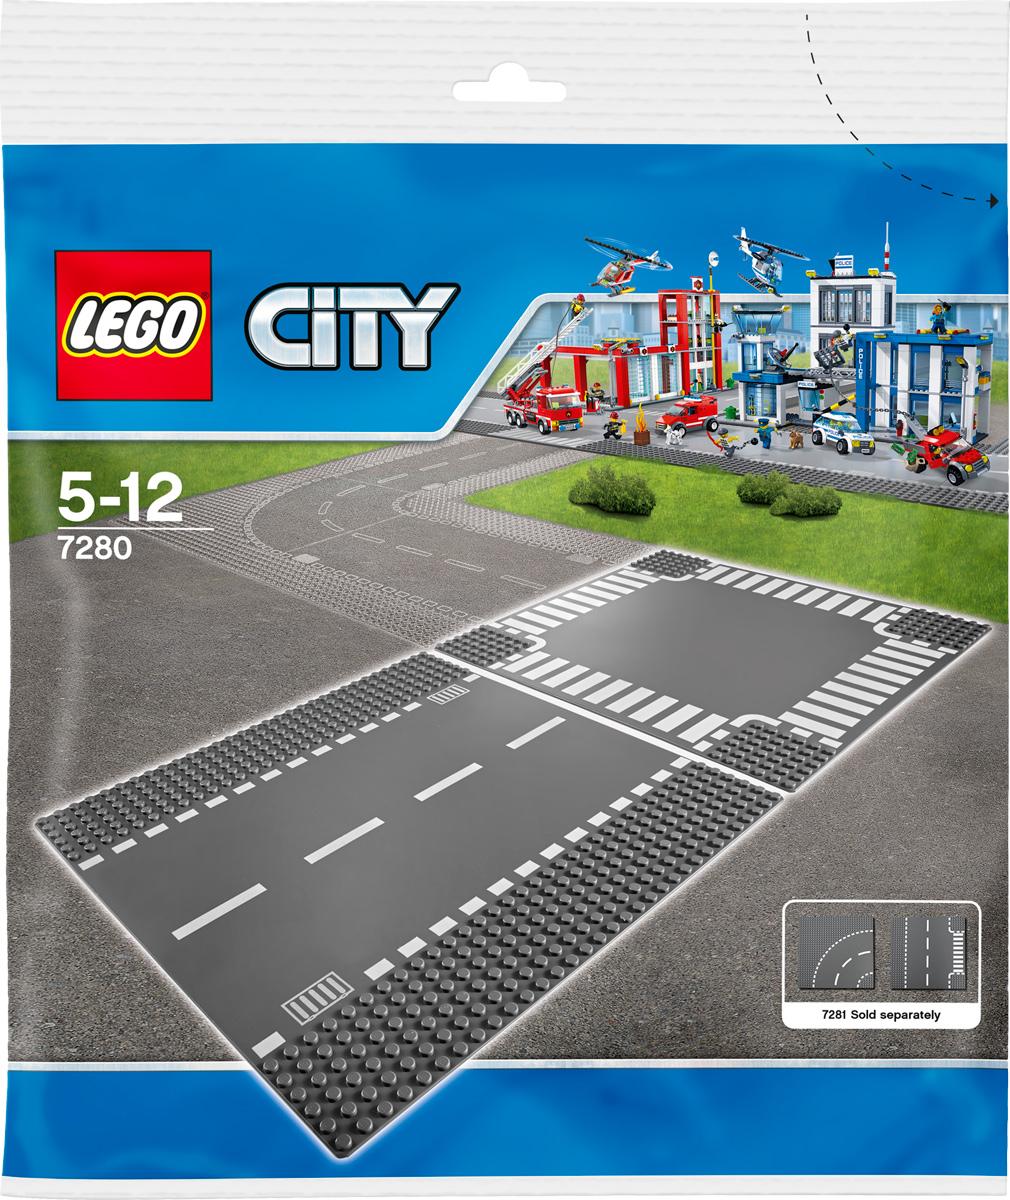 LEGO City Конструктор Перекресток 7280 lego city конструктор внедорожник каскадера 60146